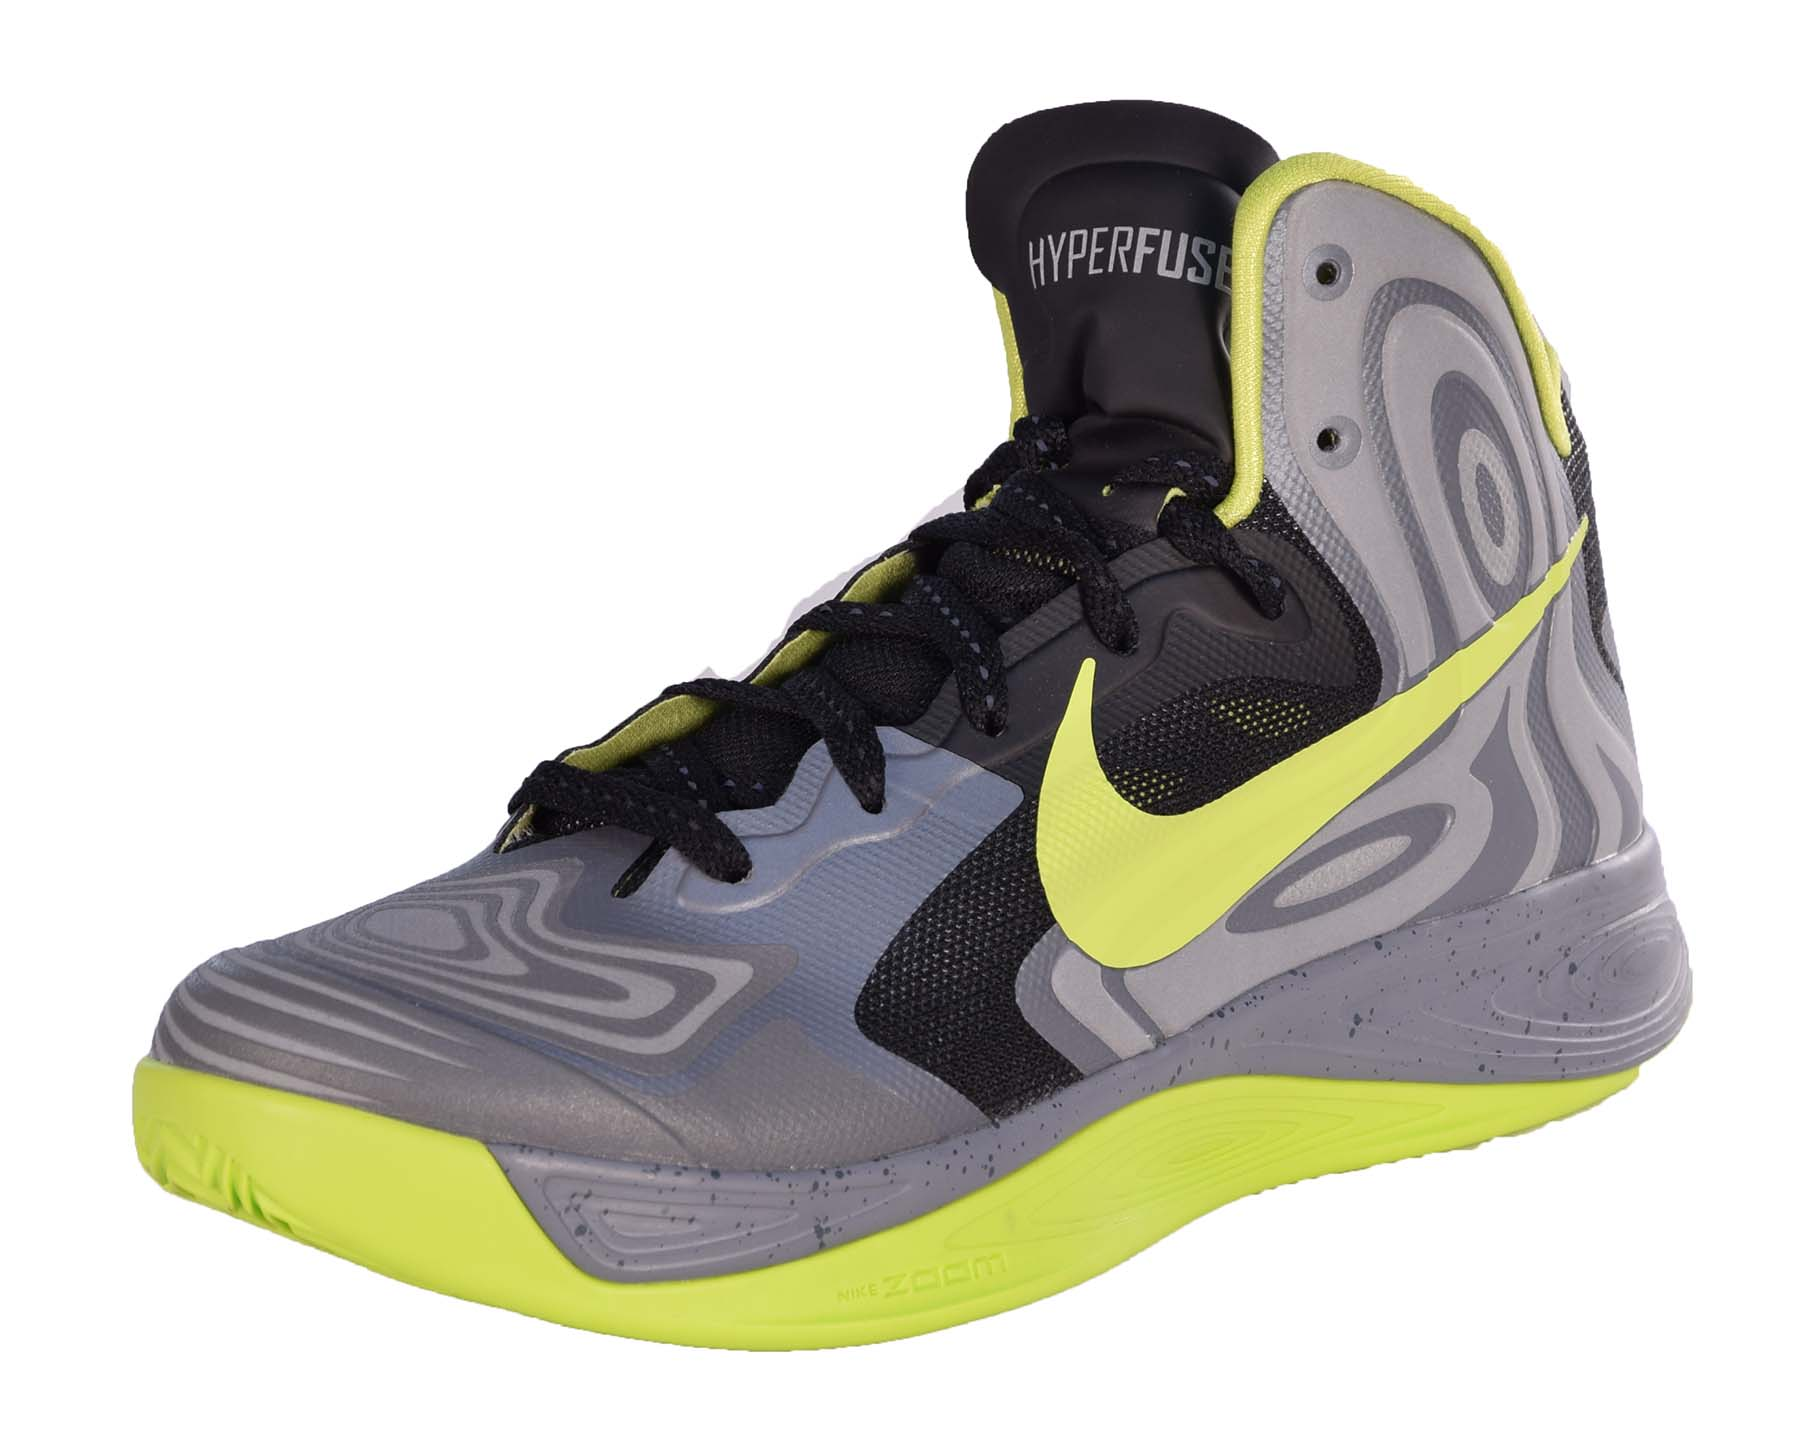 Mens Nike Hyperfuse Basketball Shoes